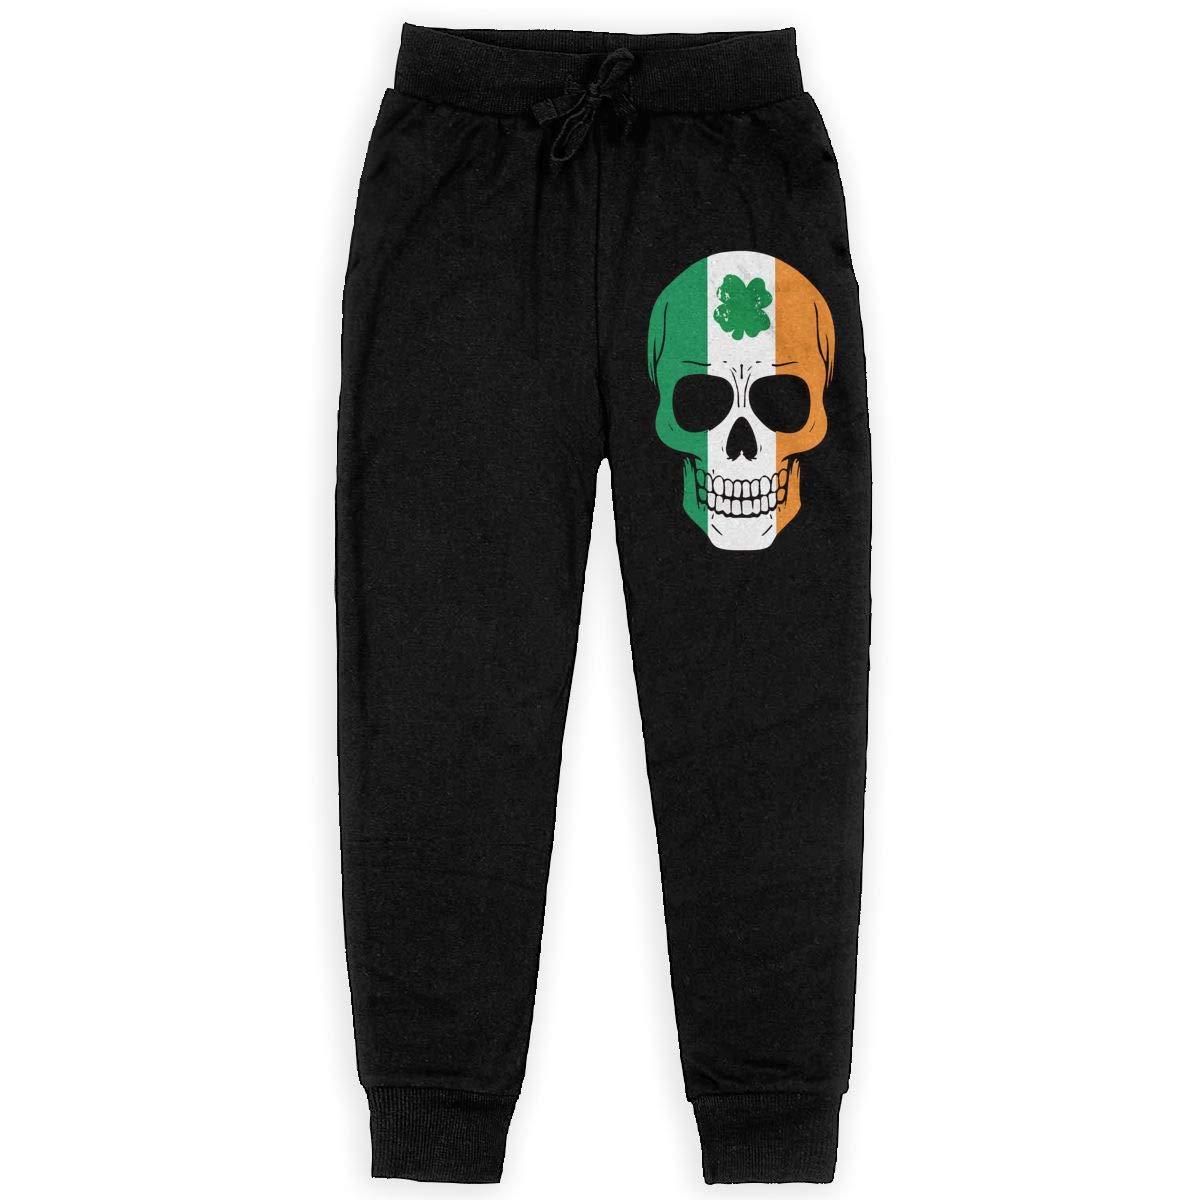 WYZVK22 Irish Skull St Patricks Day Soft//Cozy Sweatpants Boys Active Pants for Teenager Girls